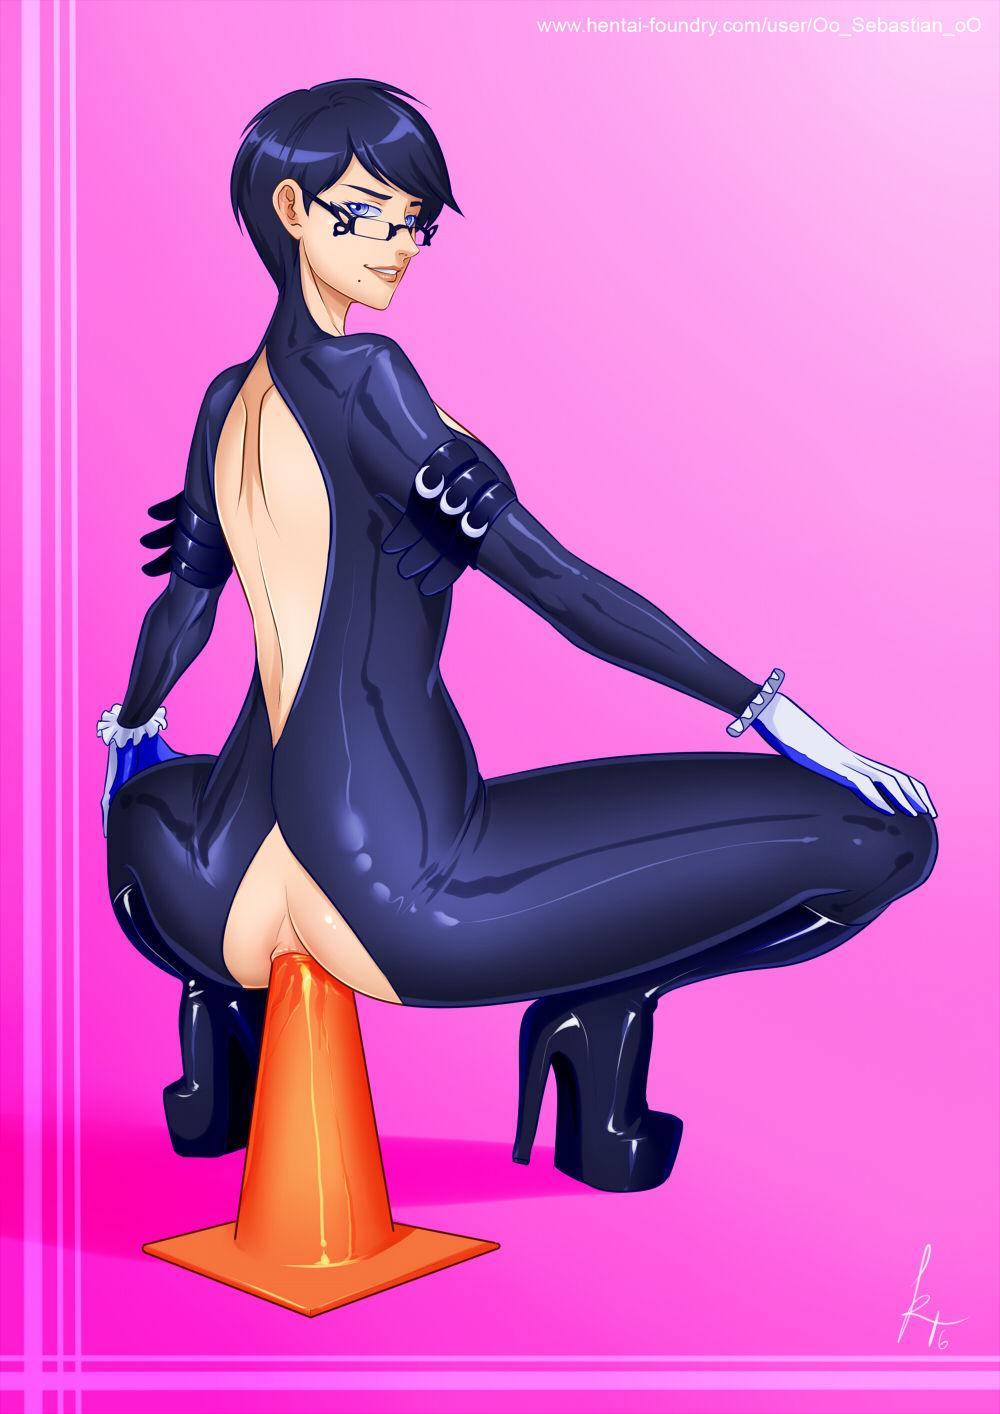 ass bayonetta bayonetta_(character) cone glasses high_heels oo_sebastian_oo_(artist) pussy riding squat